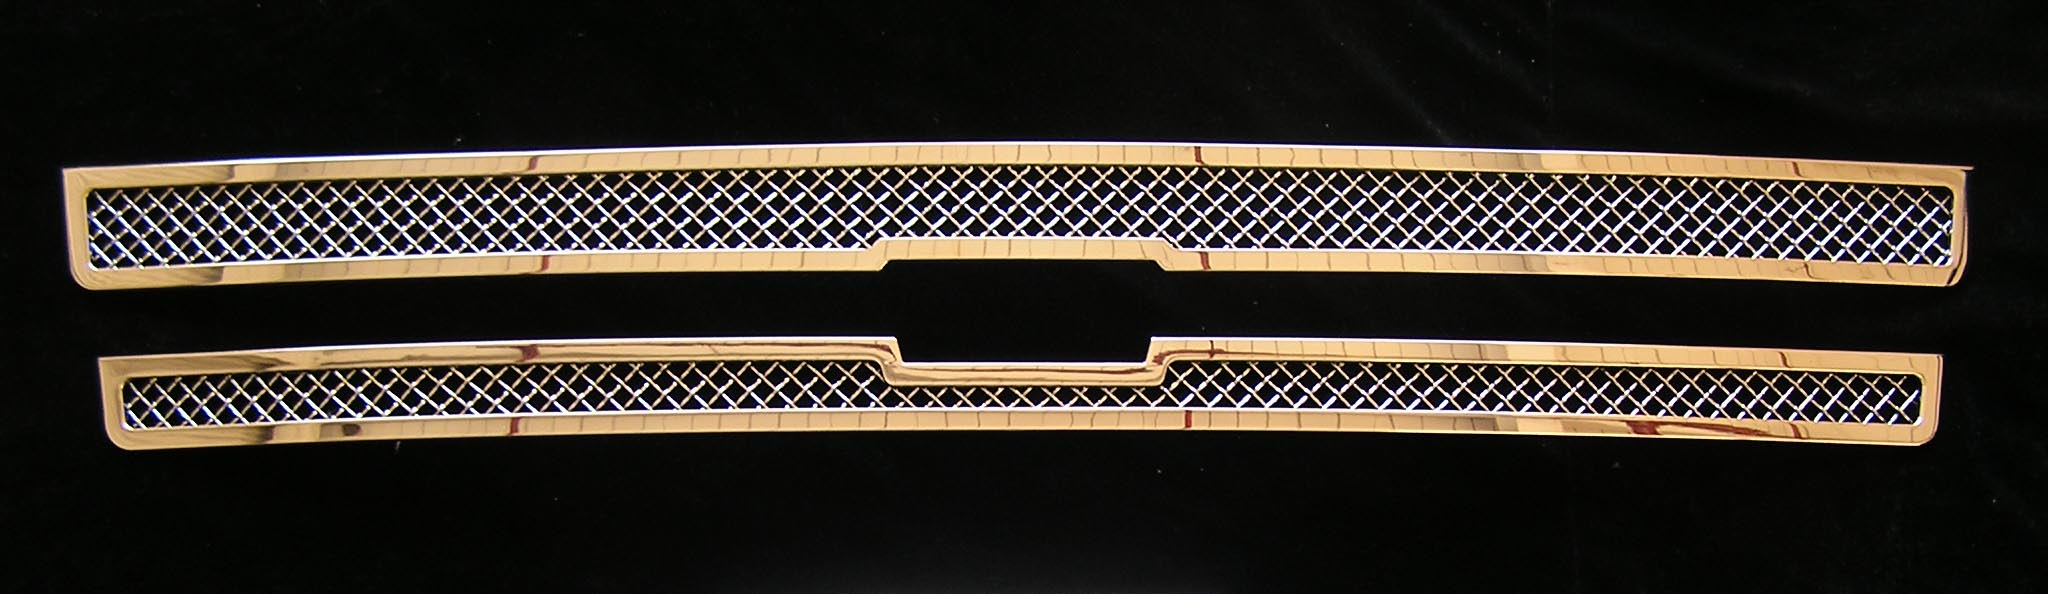 Mesh Grille 2002-2005 Chevy Trailblazer SS Main Upper Chrome